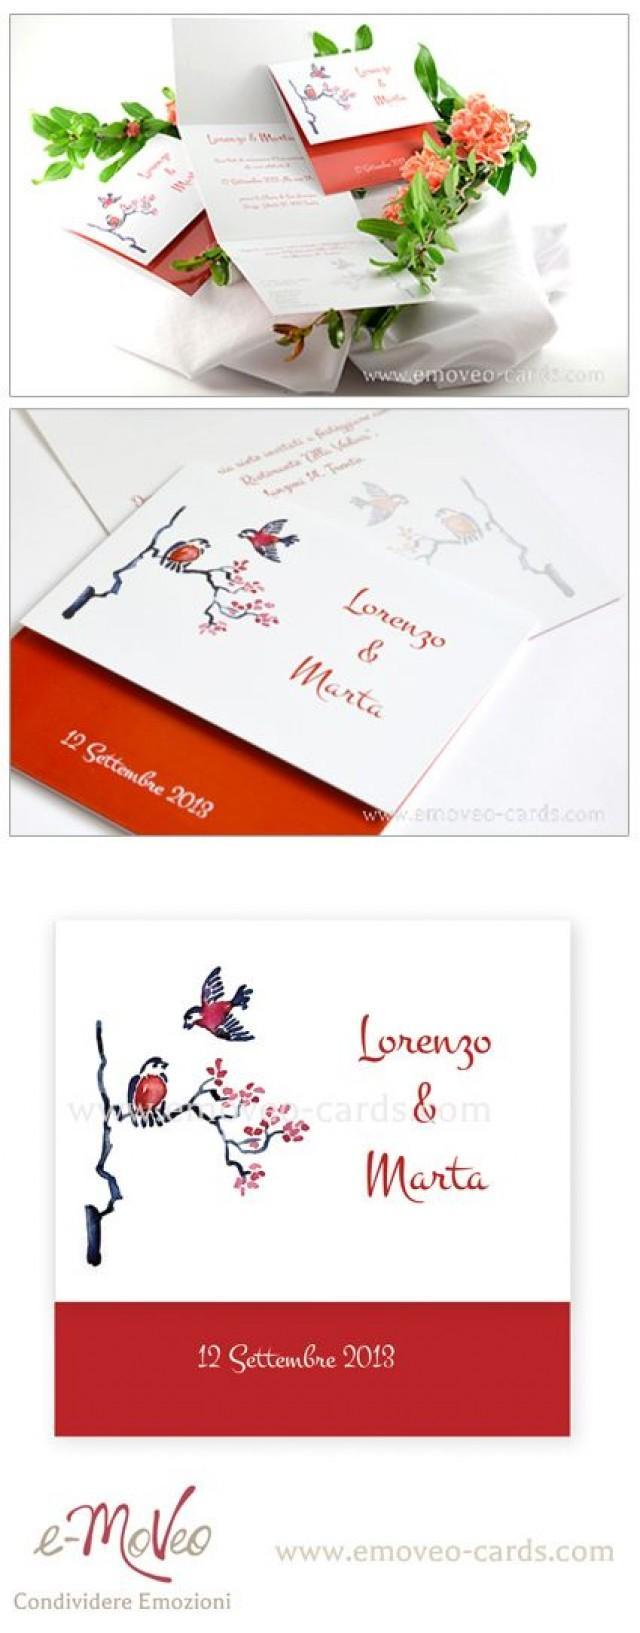 Matrimonio In Rosso : Wedding in red matrimonio rosso hochzeit rot